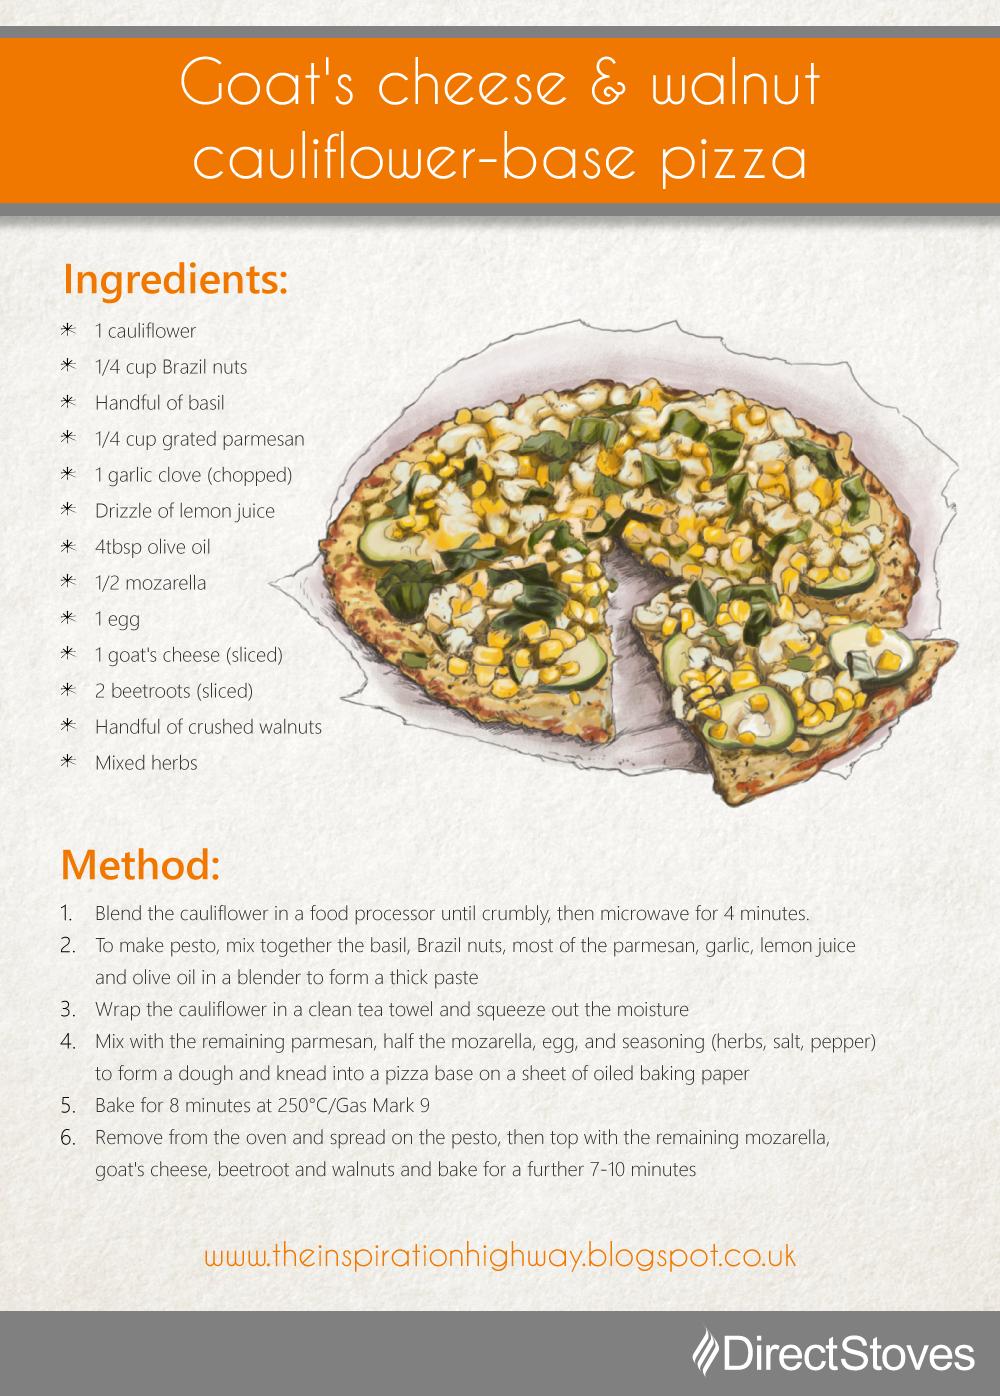 Pizza recipe card: Goat's cheese & walnut cauliflower-base pizza